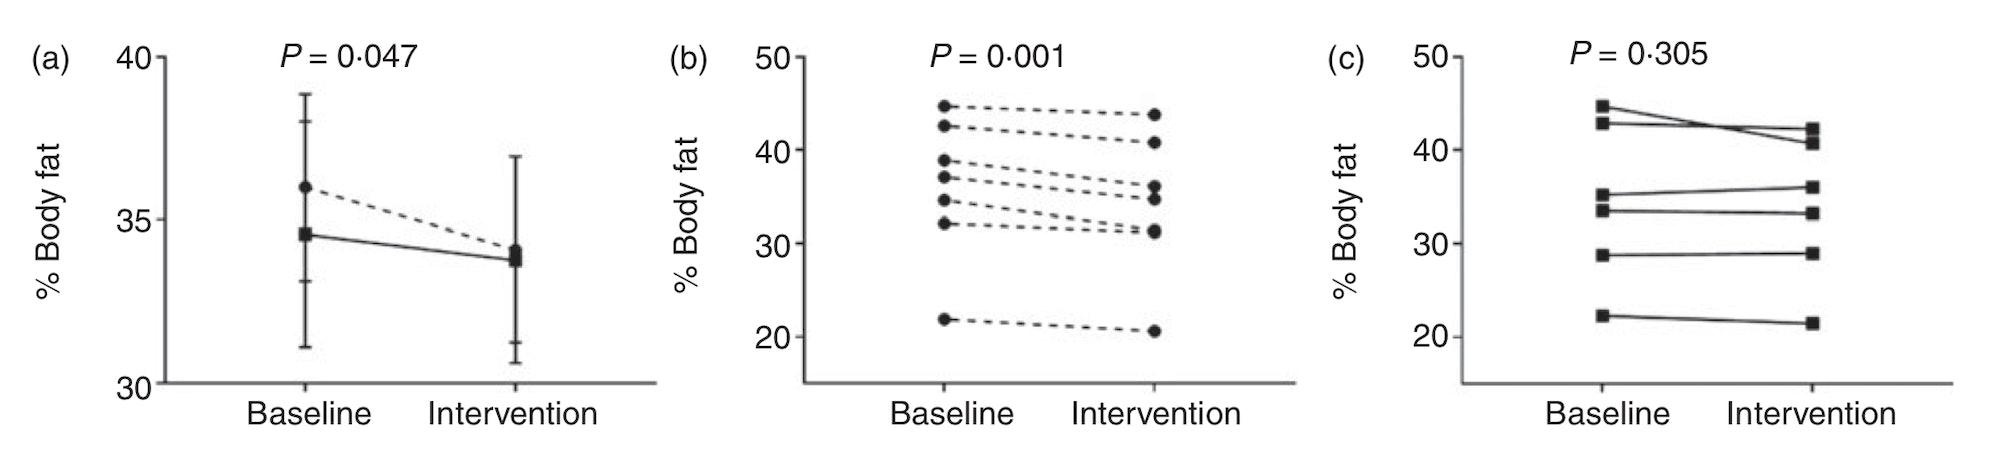 intermittent fasting body fat